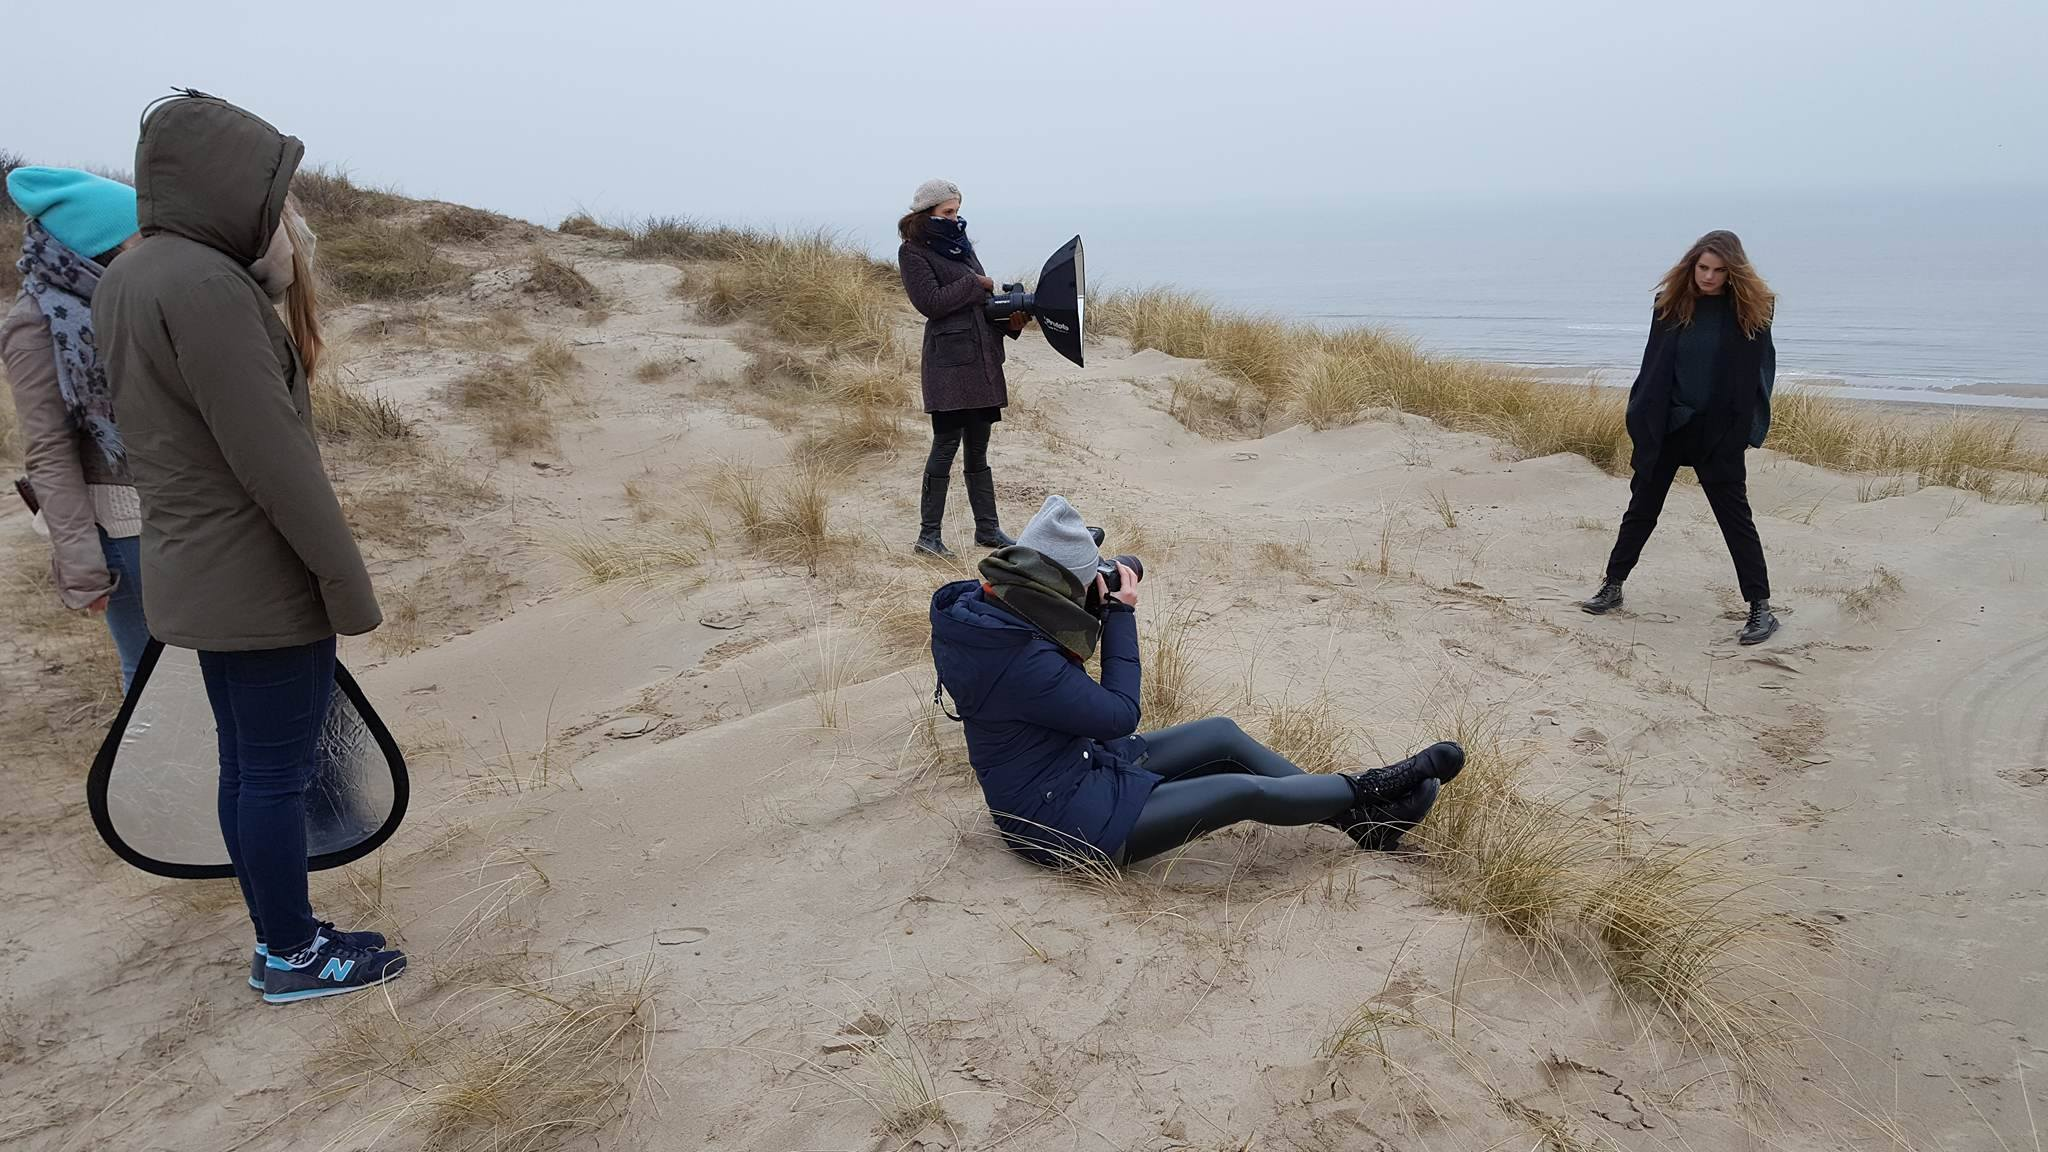 Behind the scene - Mountain shoot Zandvoort